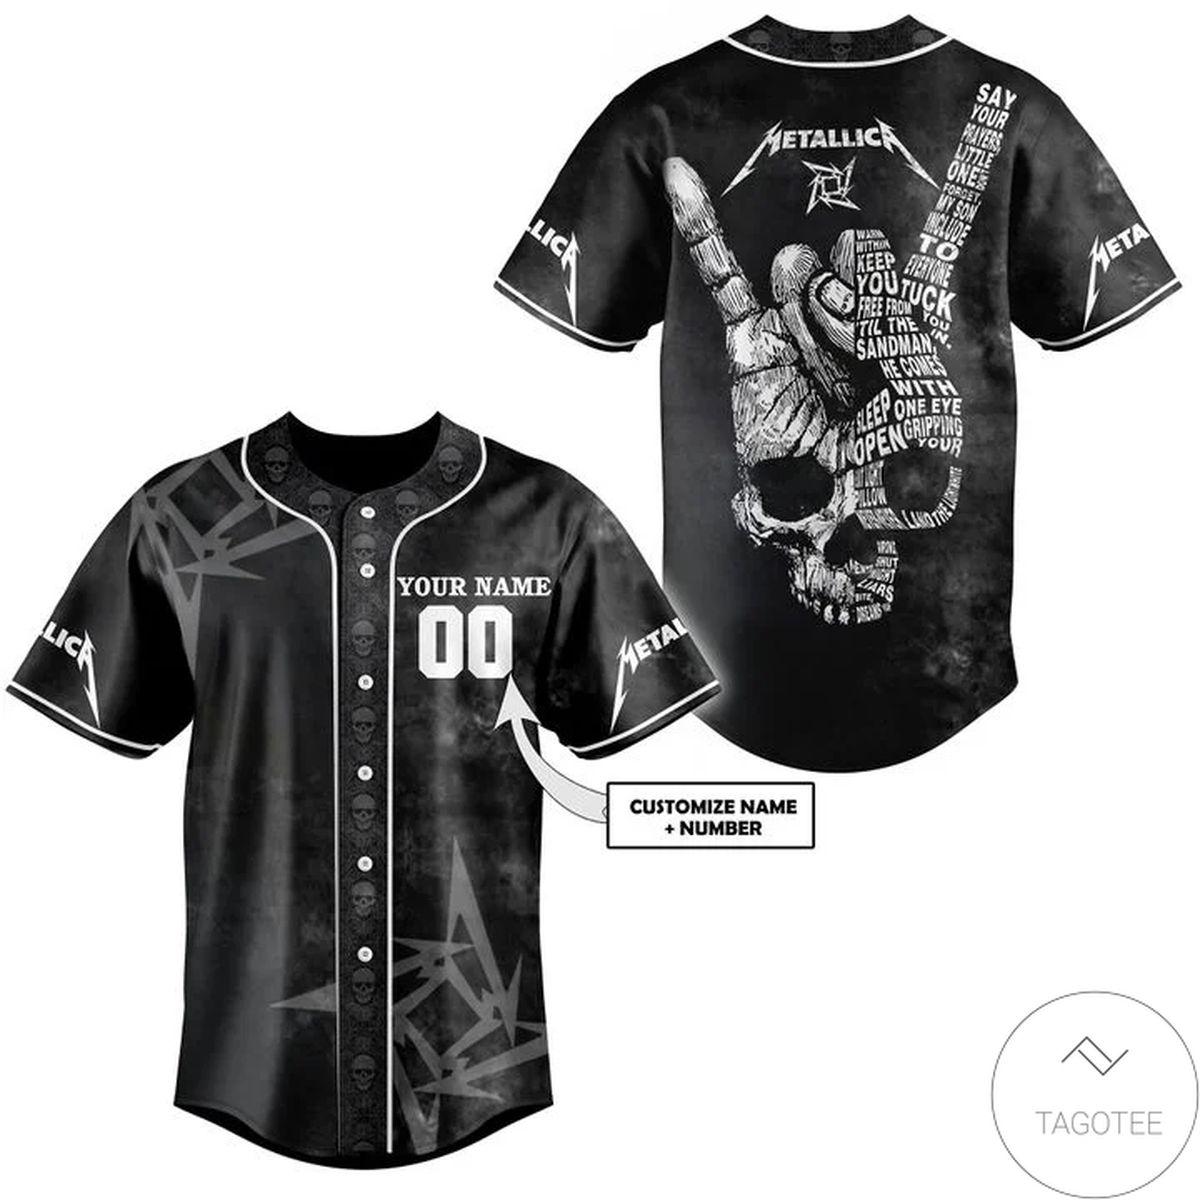 Personalized Metallic Skull Rock N Roll Baseball Jersey